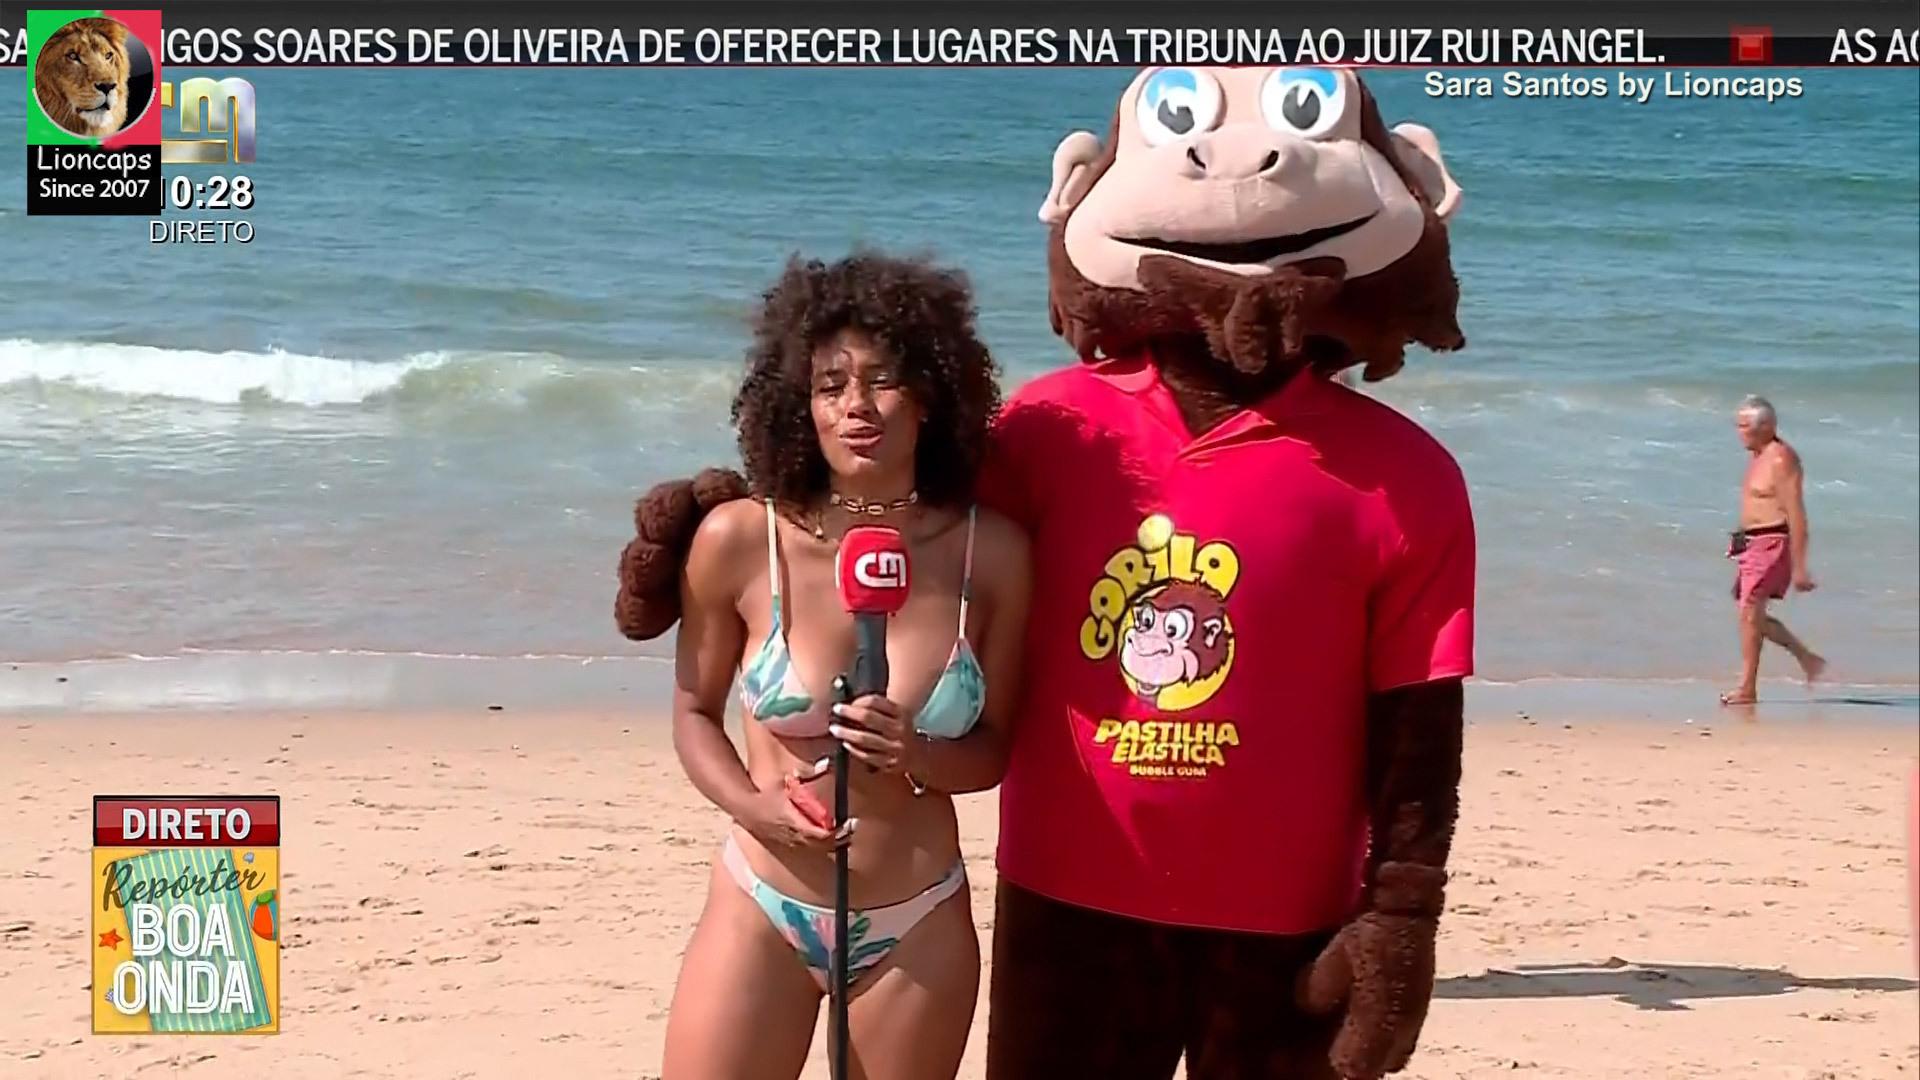 sara_santos_praia_lioncaps_24_07_2021_01 (7).jpg